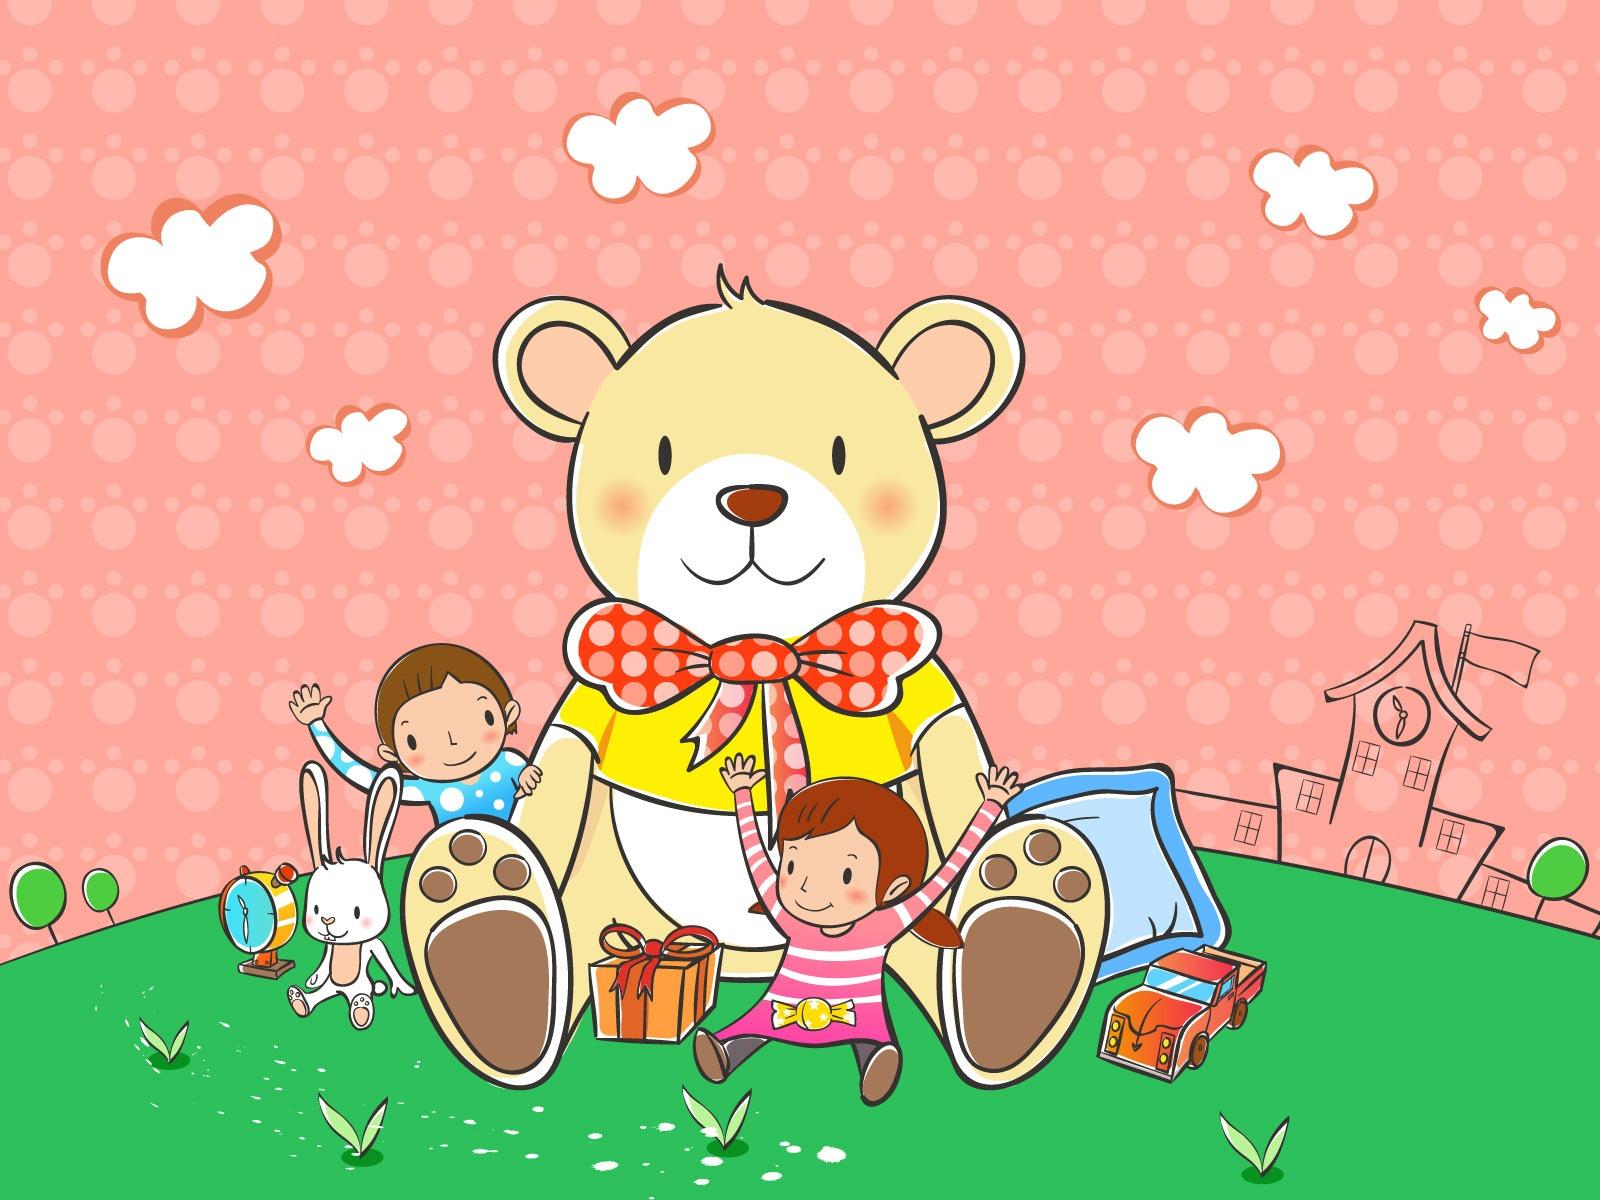 Vectores de dibujos animados fondos de escritorio de la infancia 2 14 1600x1200 fondos de - Fondos de escritorio animados ...